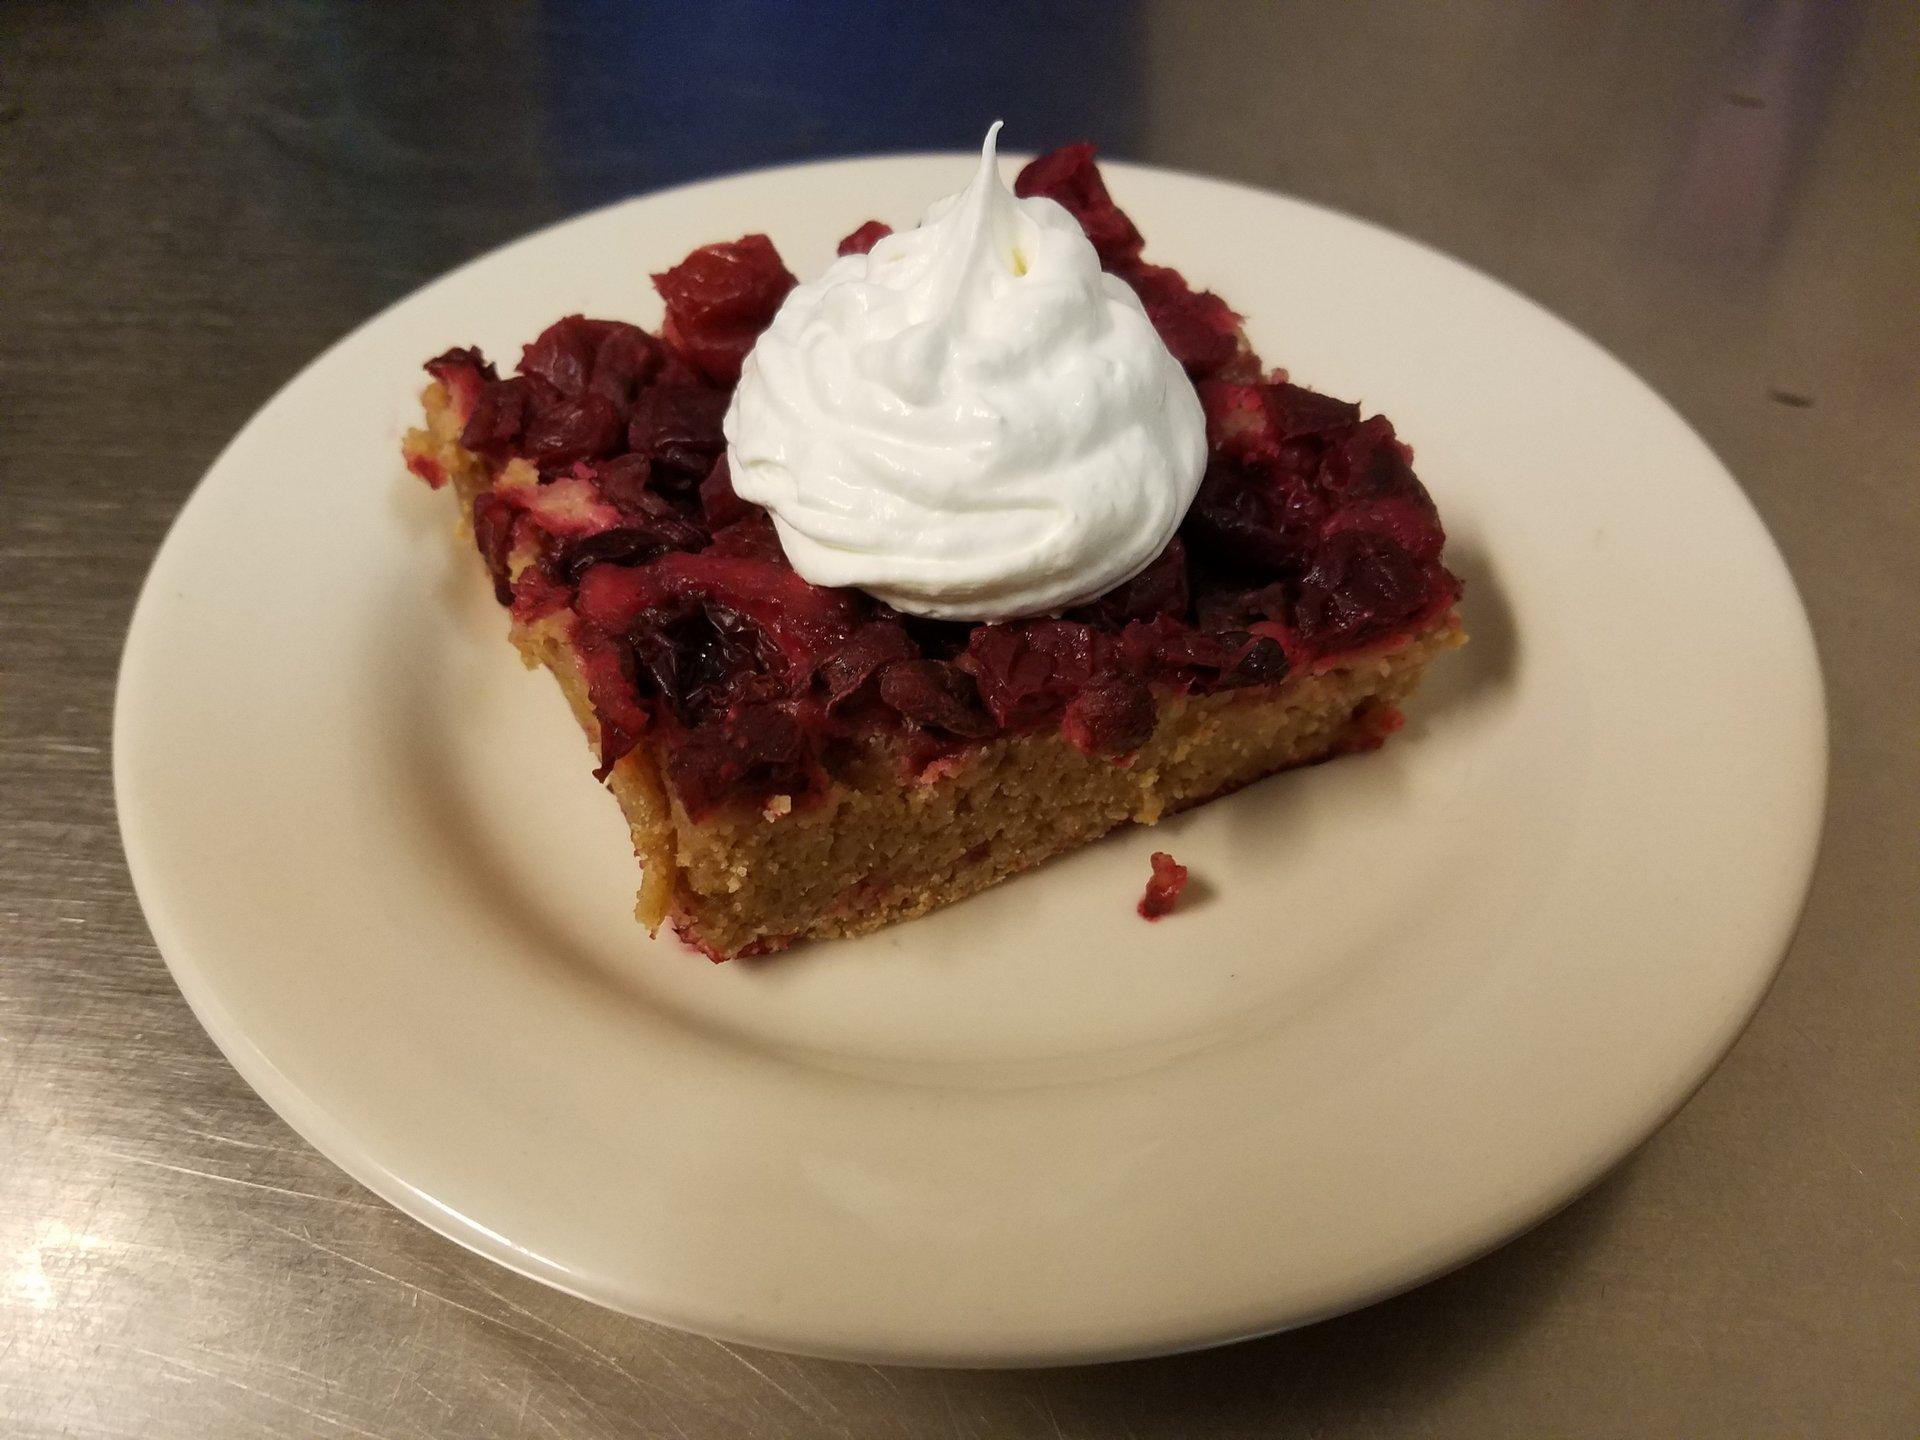 Farm inn on main dessert special-shawano wisconsin